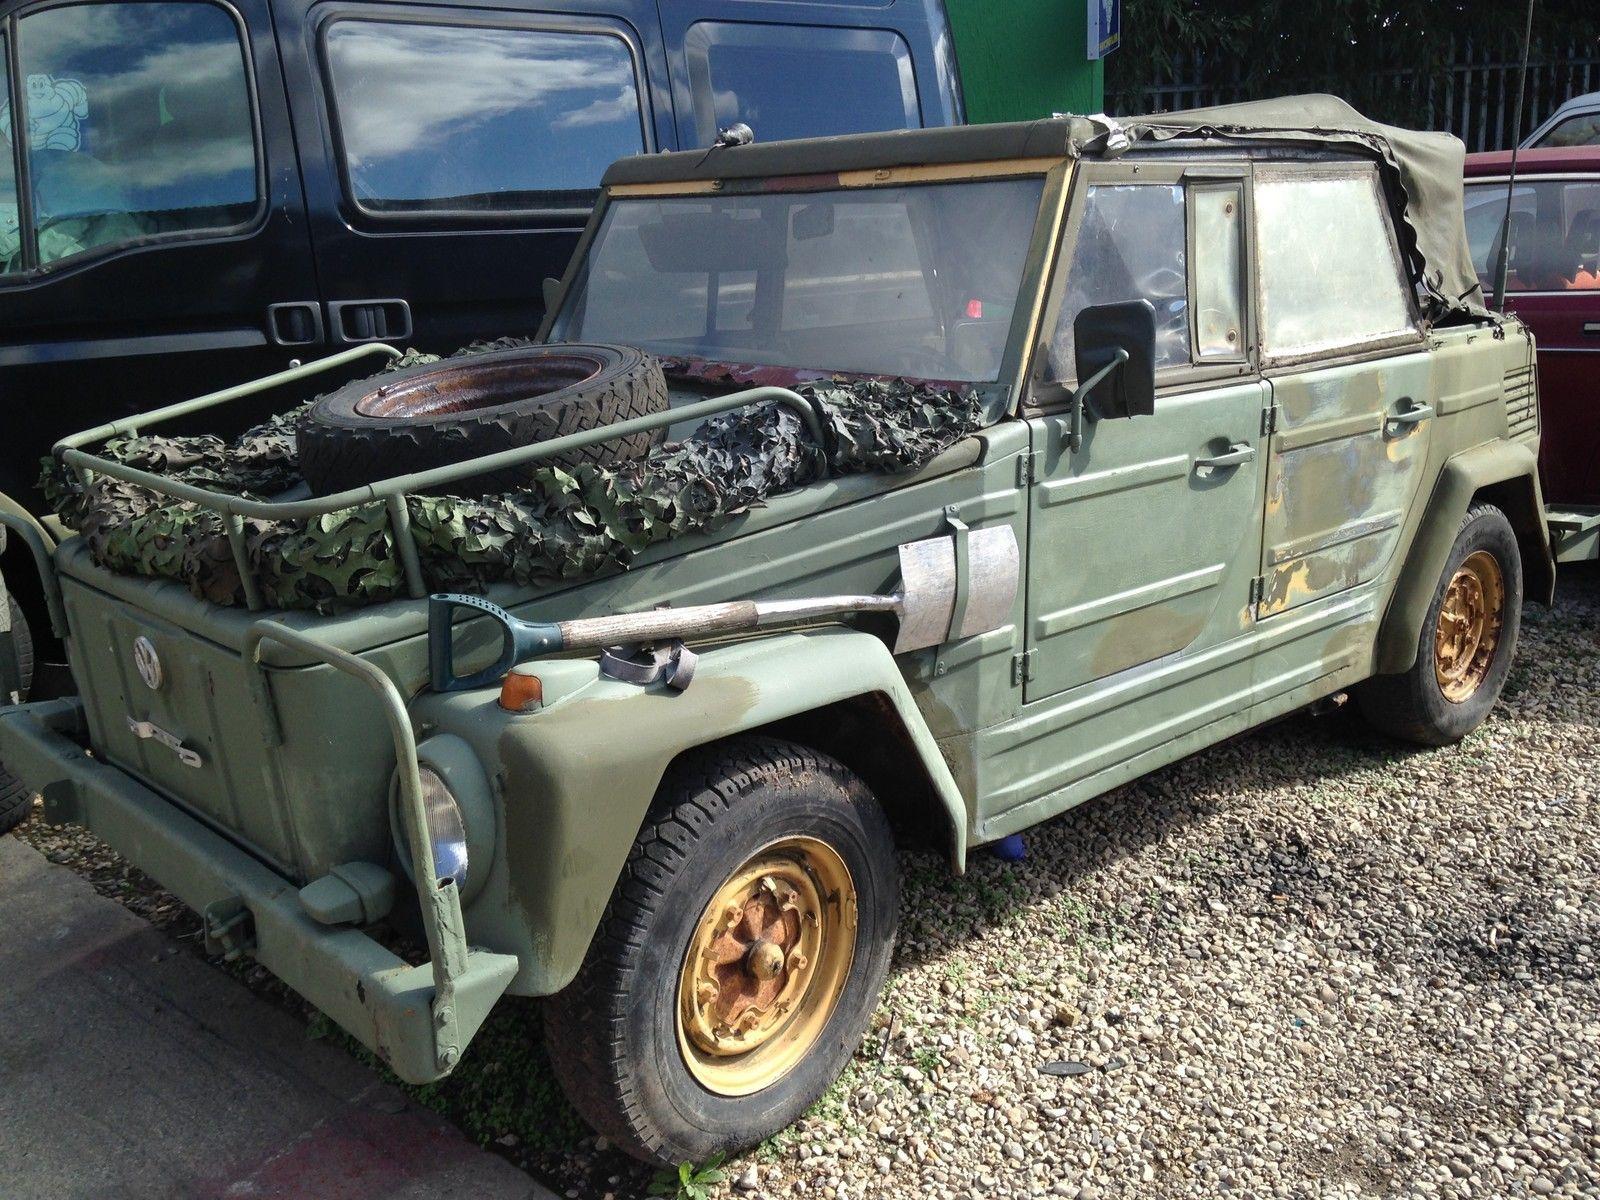 volkswagen 181 thing trekker military army car no splitscreen classic beetle volkswagen. Black Bedroom Furniture Sets. Home Design Ideas